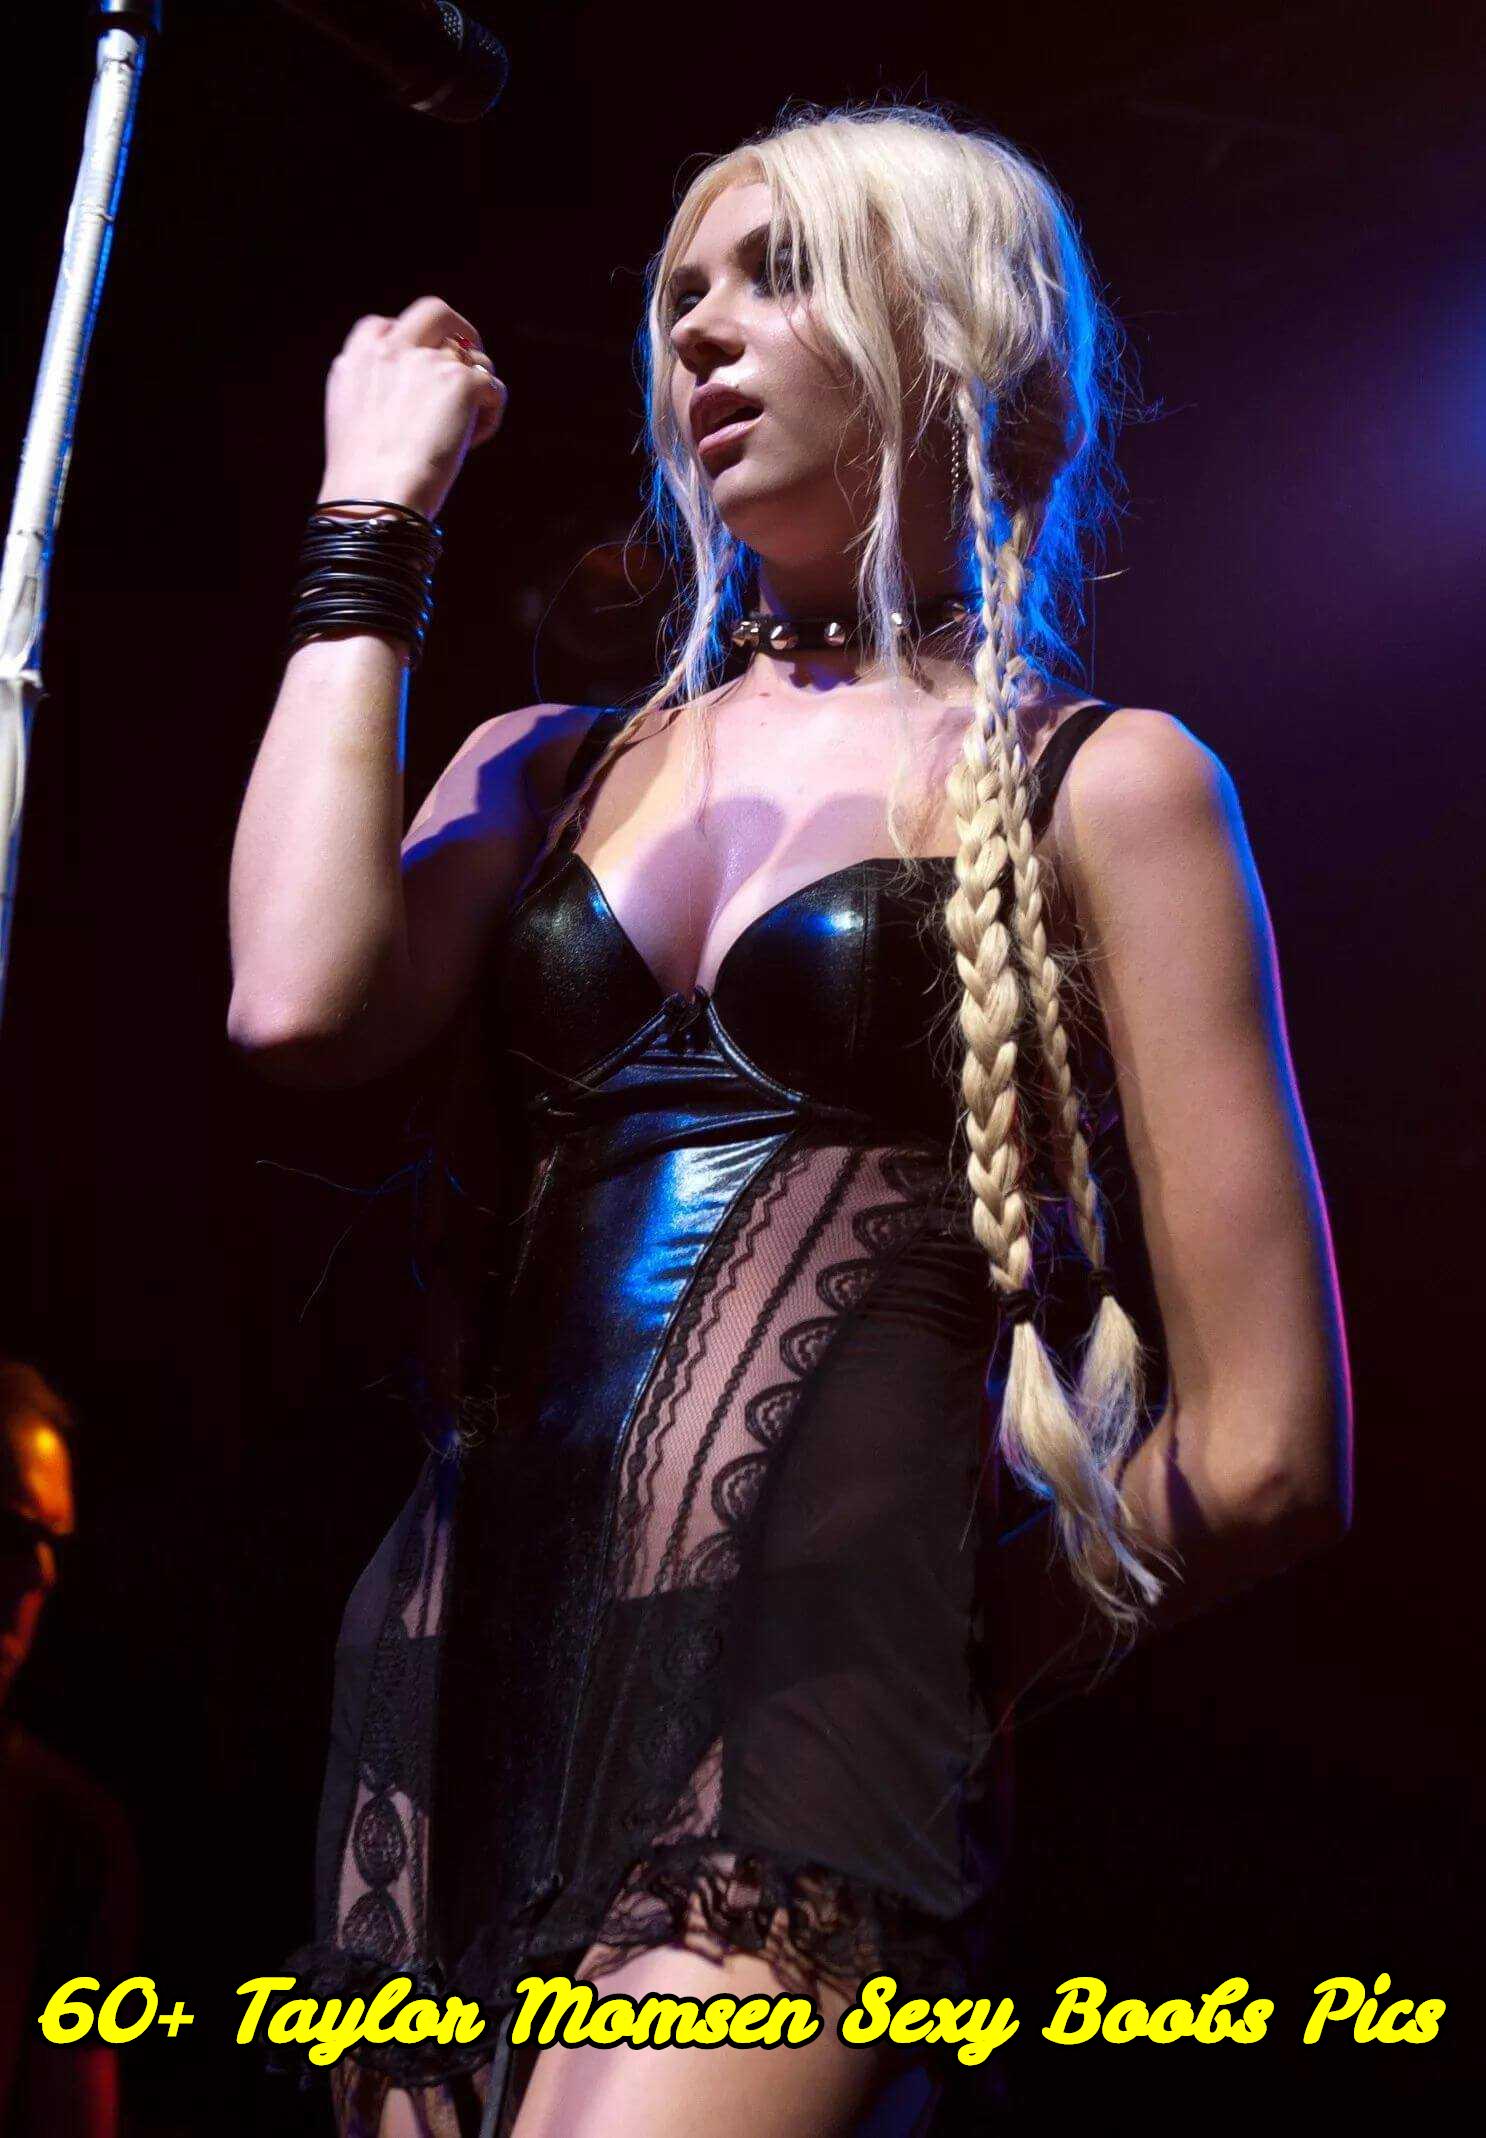 Taylor Momsen sexy boobs pics